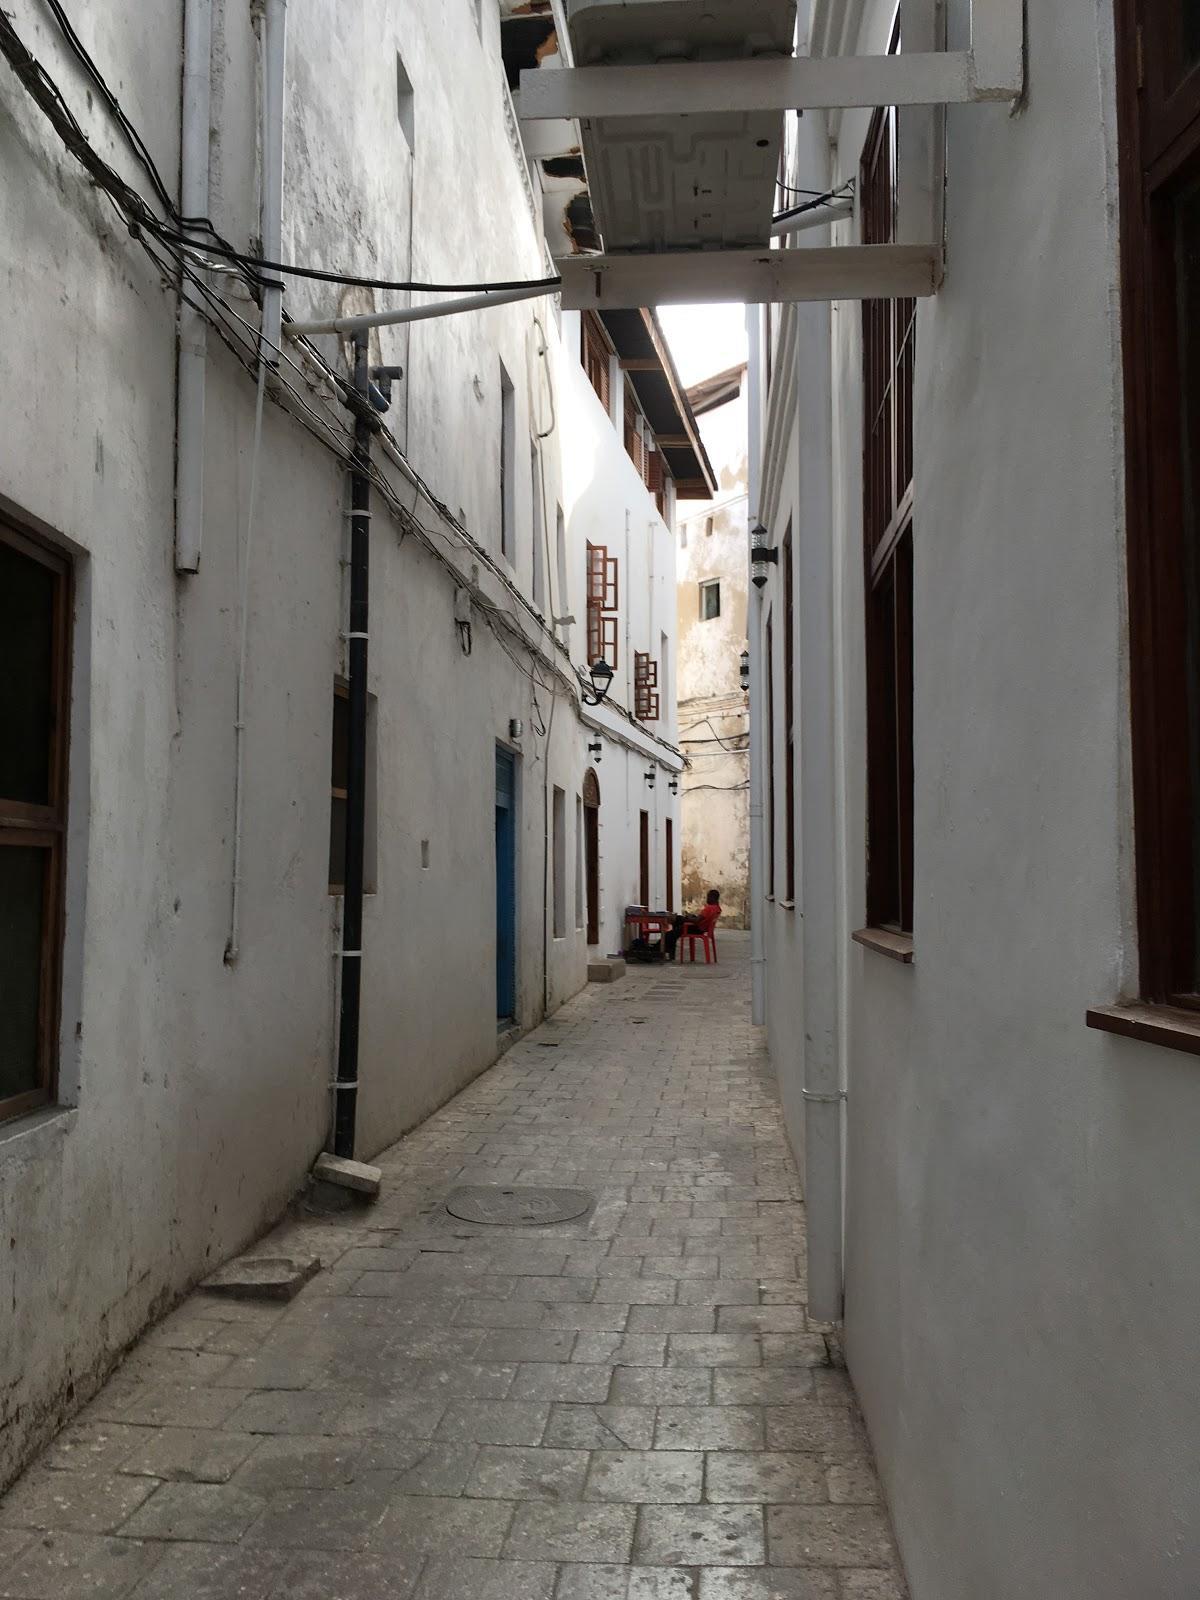 Úzke ulice v meste Stone town